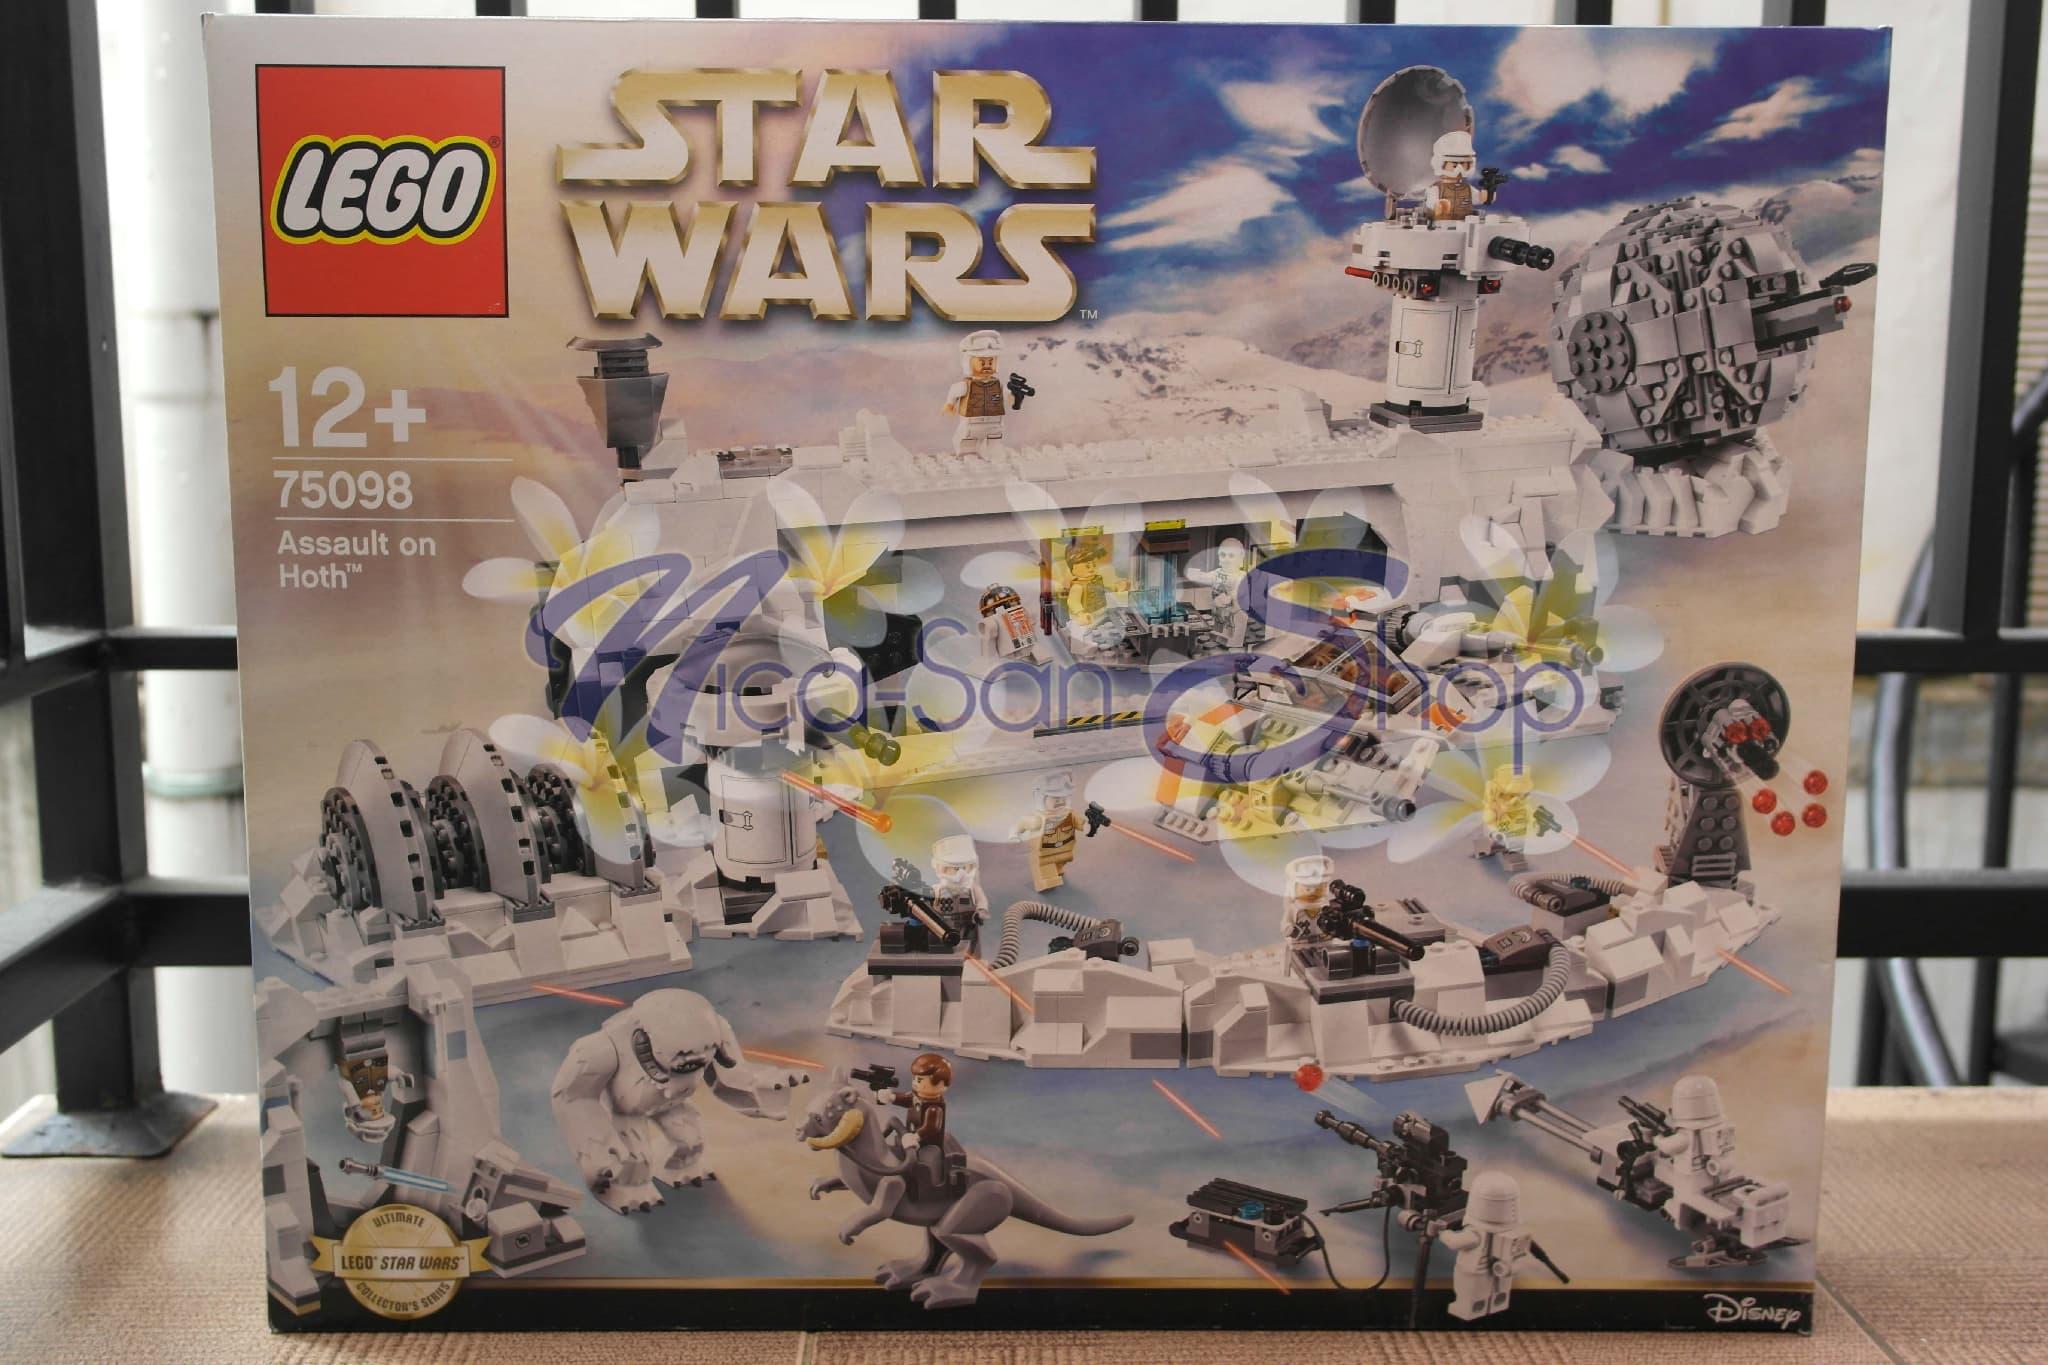 Jual Lego Star Wars Ucs 75098 Assault On Hoth Ultimate Collector Series Nicasan Shop Tokopedia